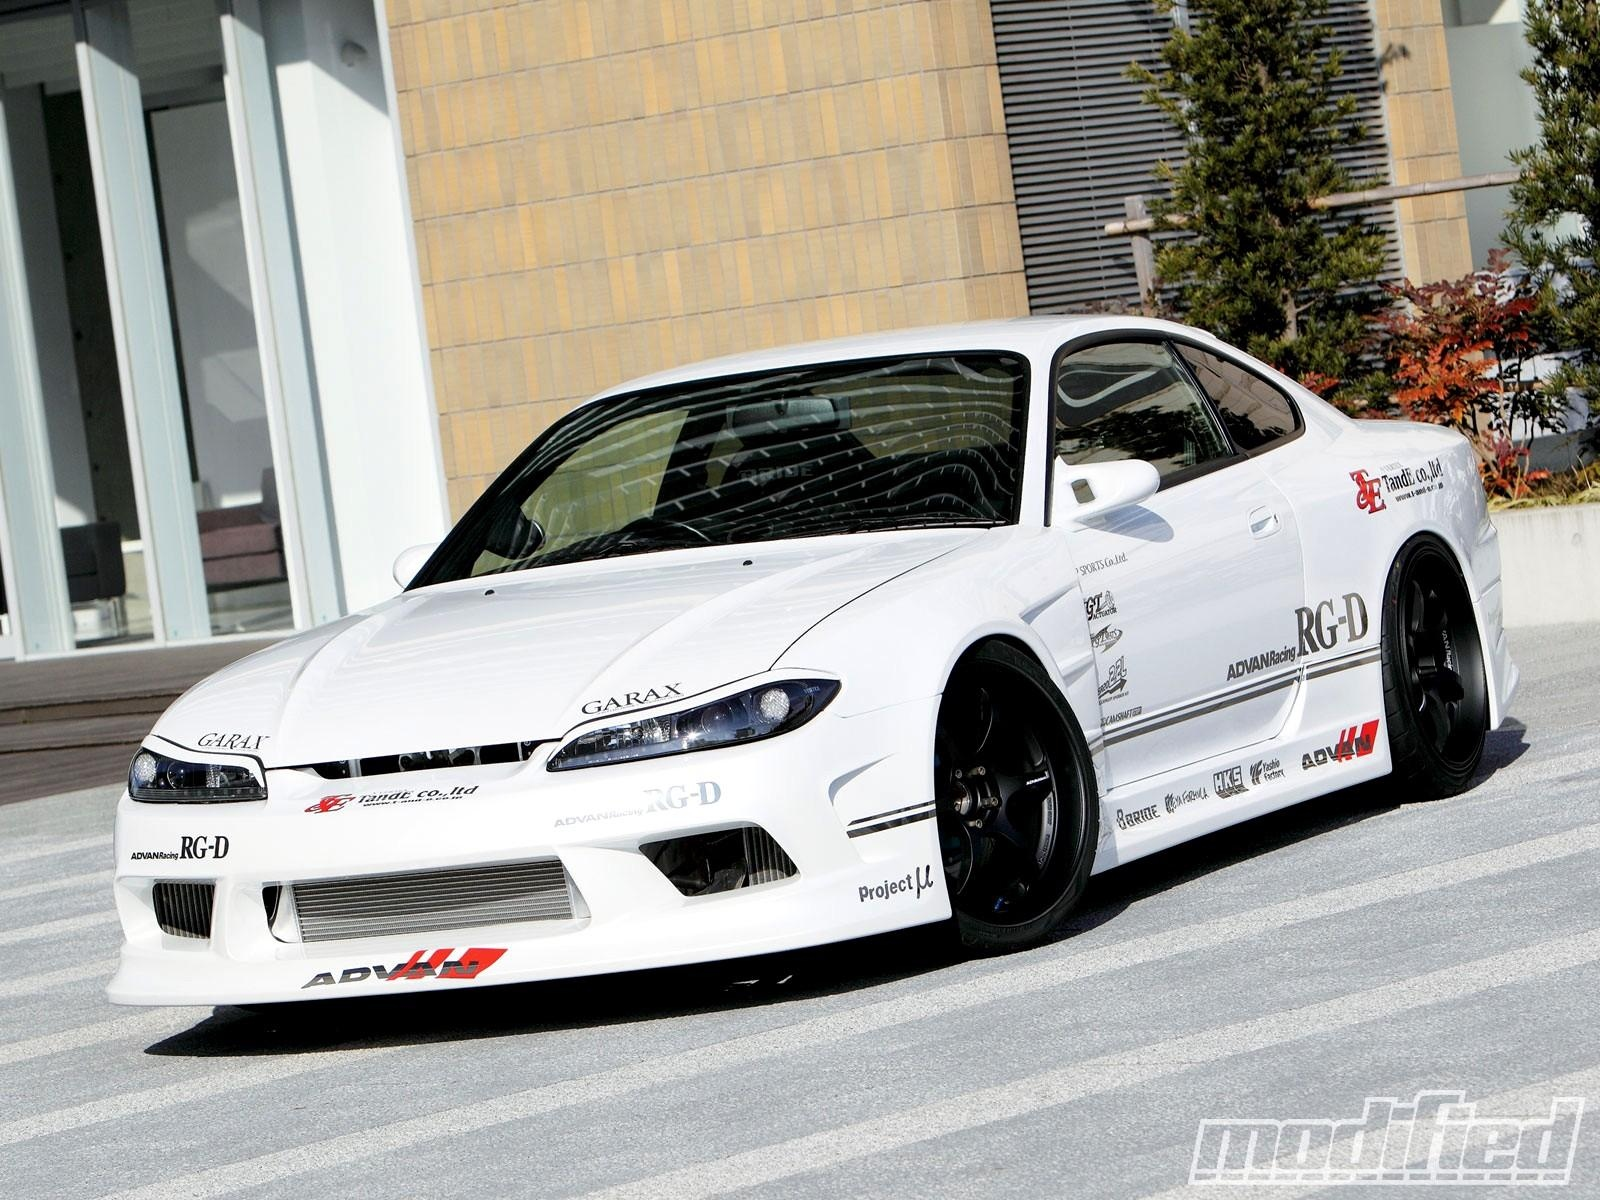 Nissan Silvia S15 Wallpaper Nissan Silvia S15 1600x1200 Wallpaper Teahub Io